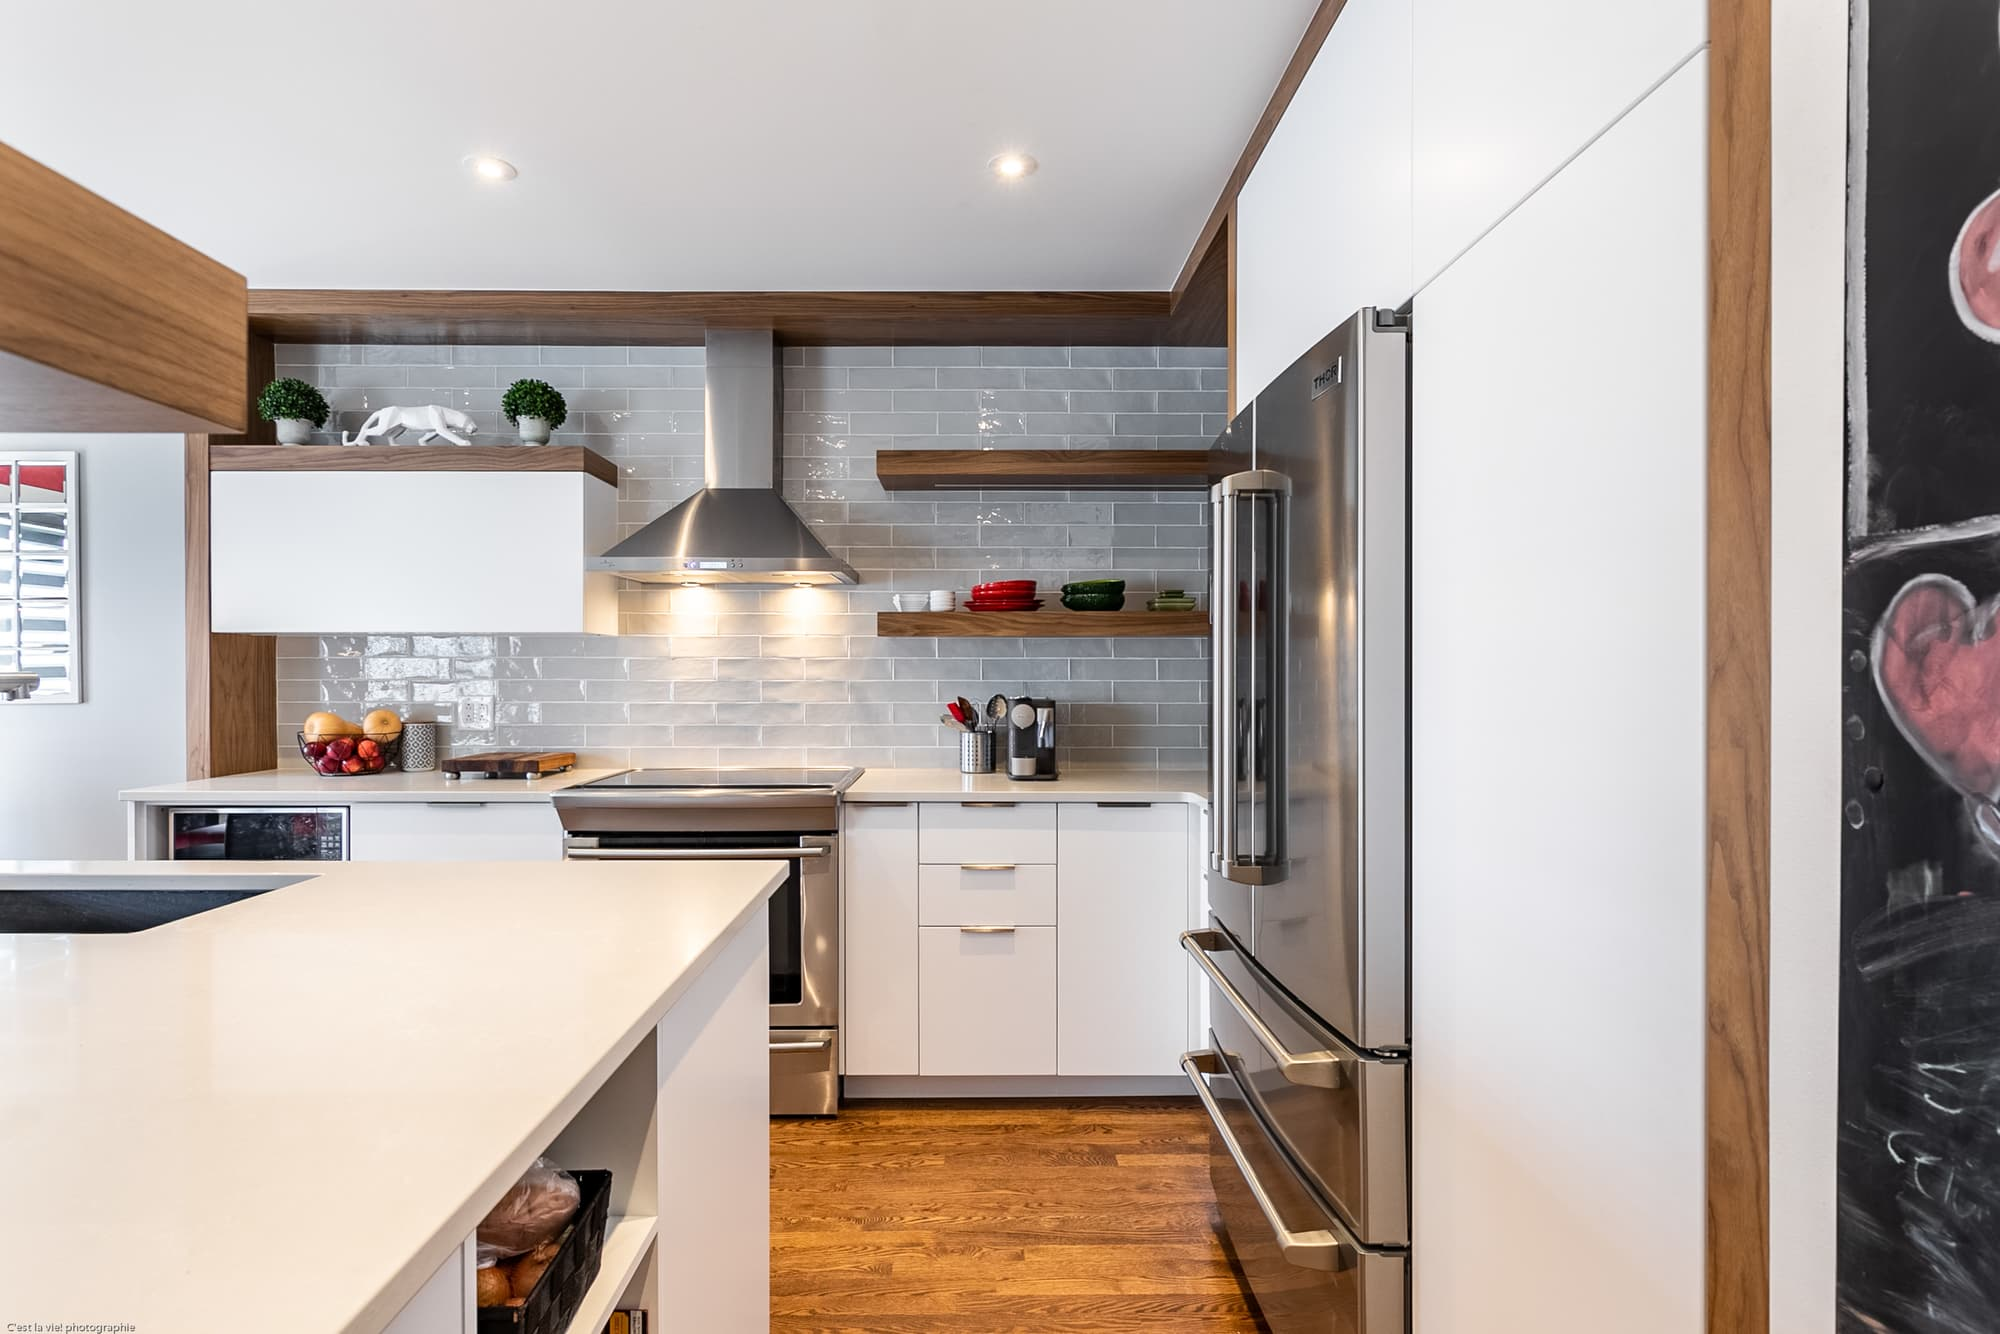 design cuisine moderne blanche avec tablettes en bois